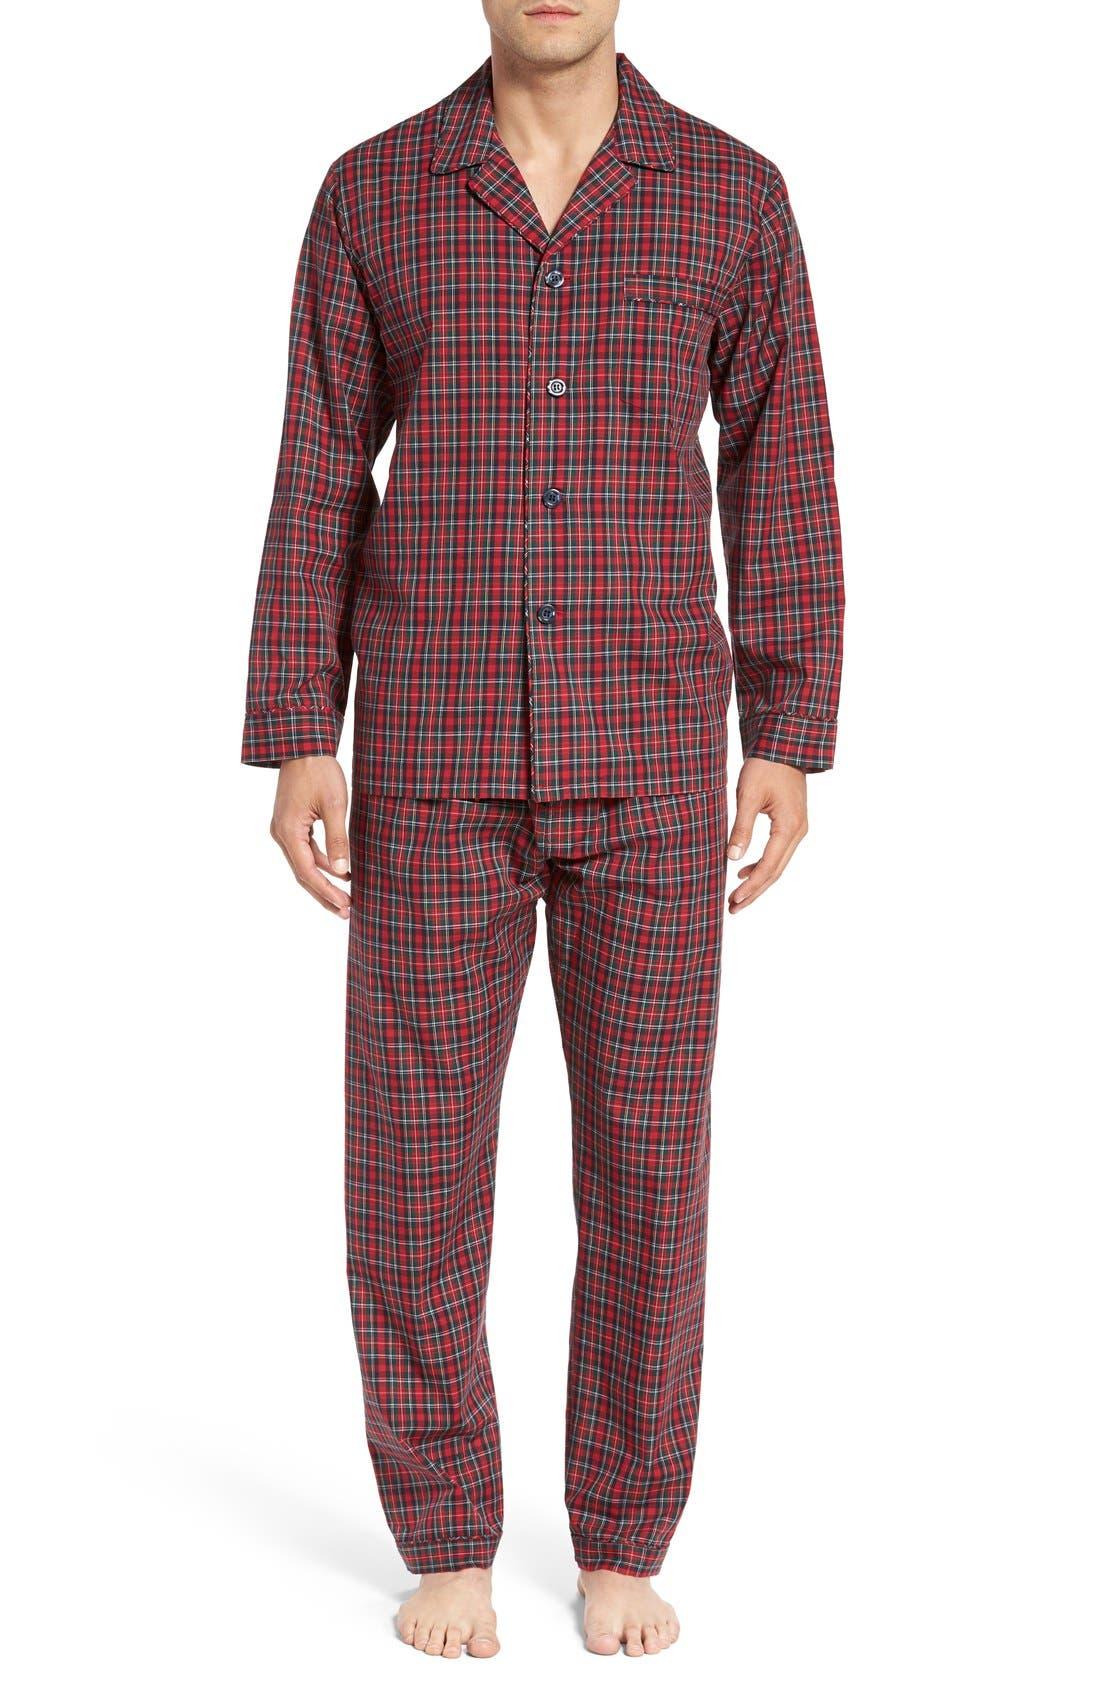 'CVC' Cotton Blend Pajamas,                         Main,                         color, Holiday Red